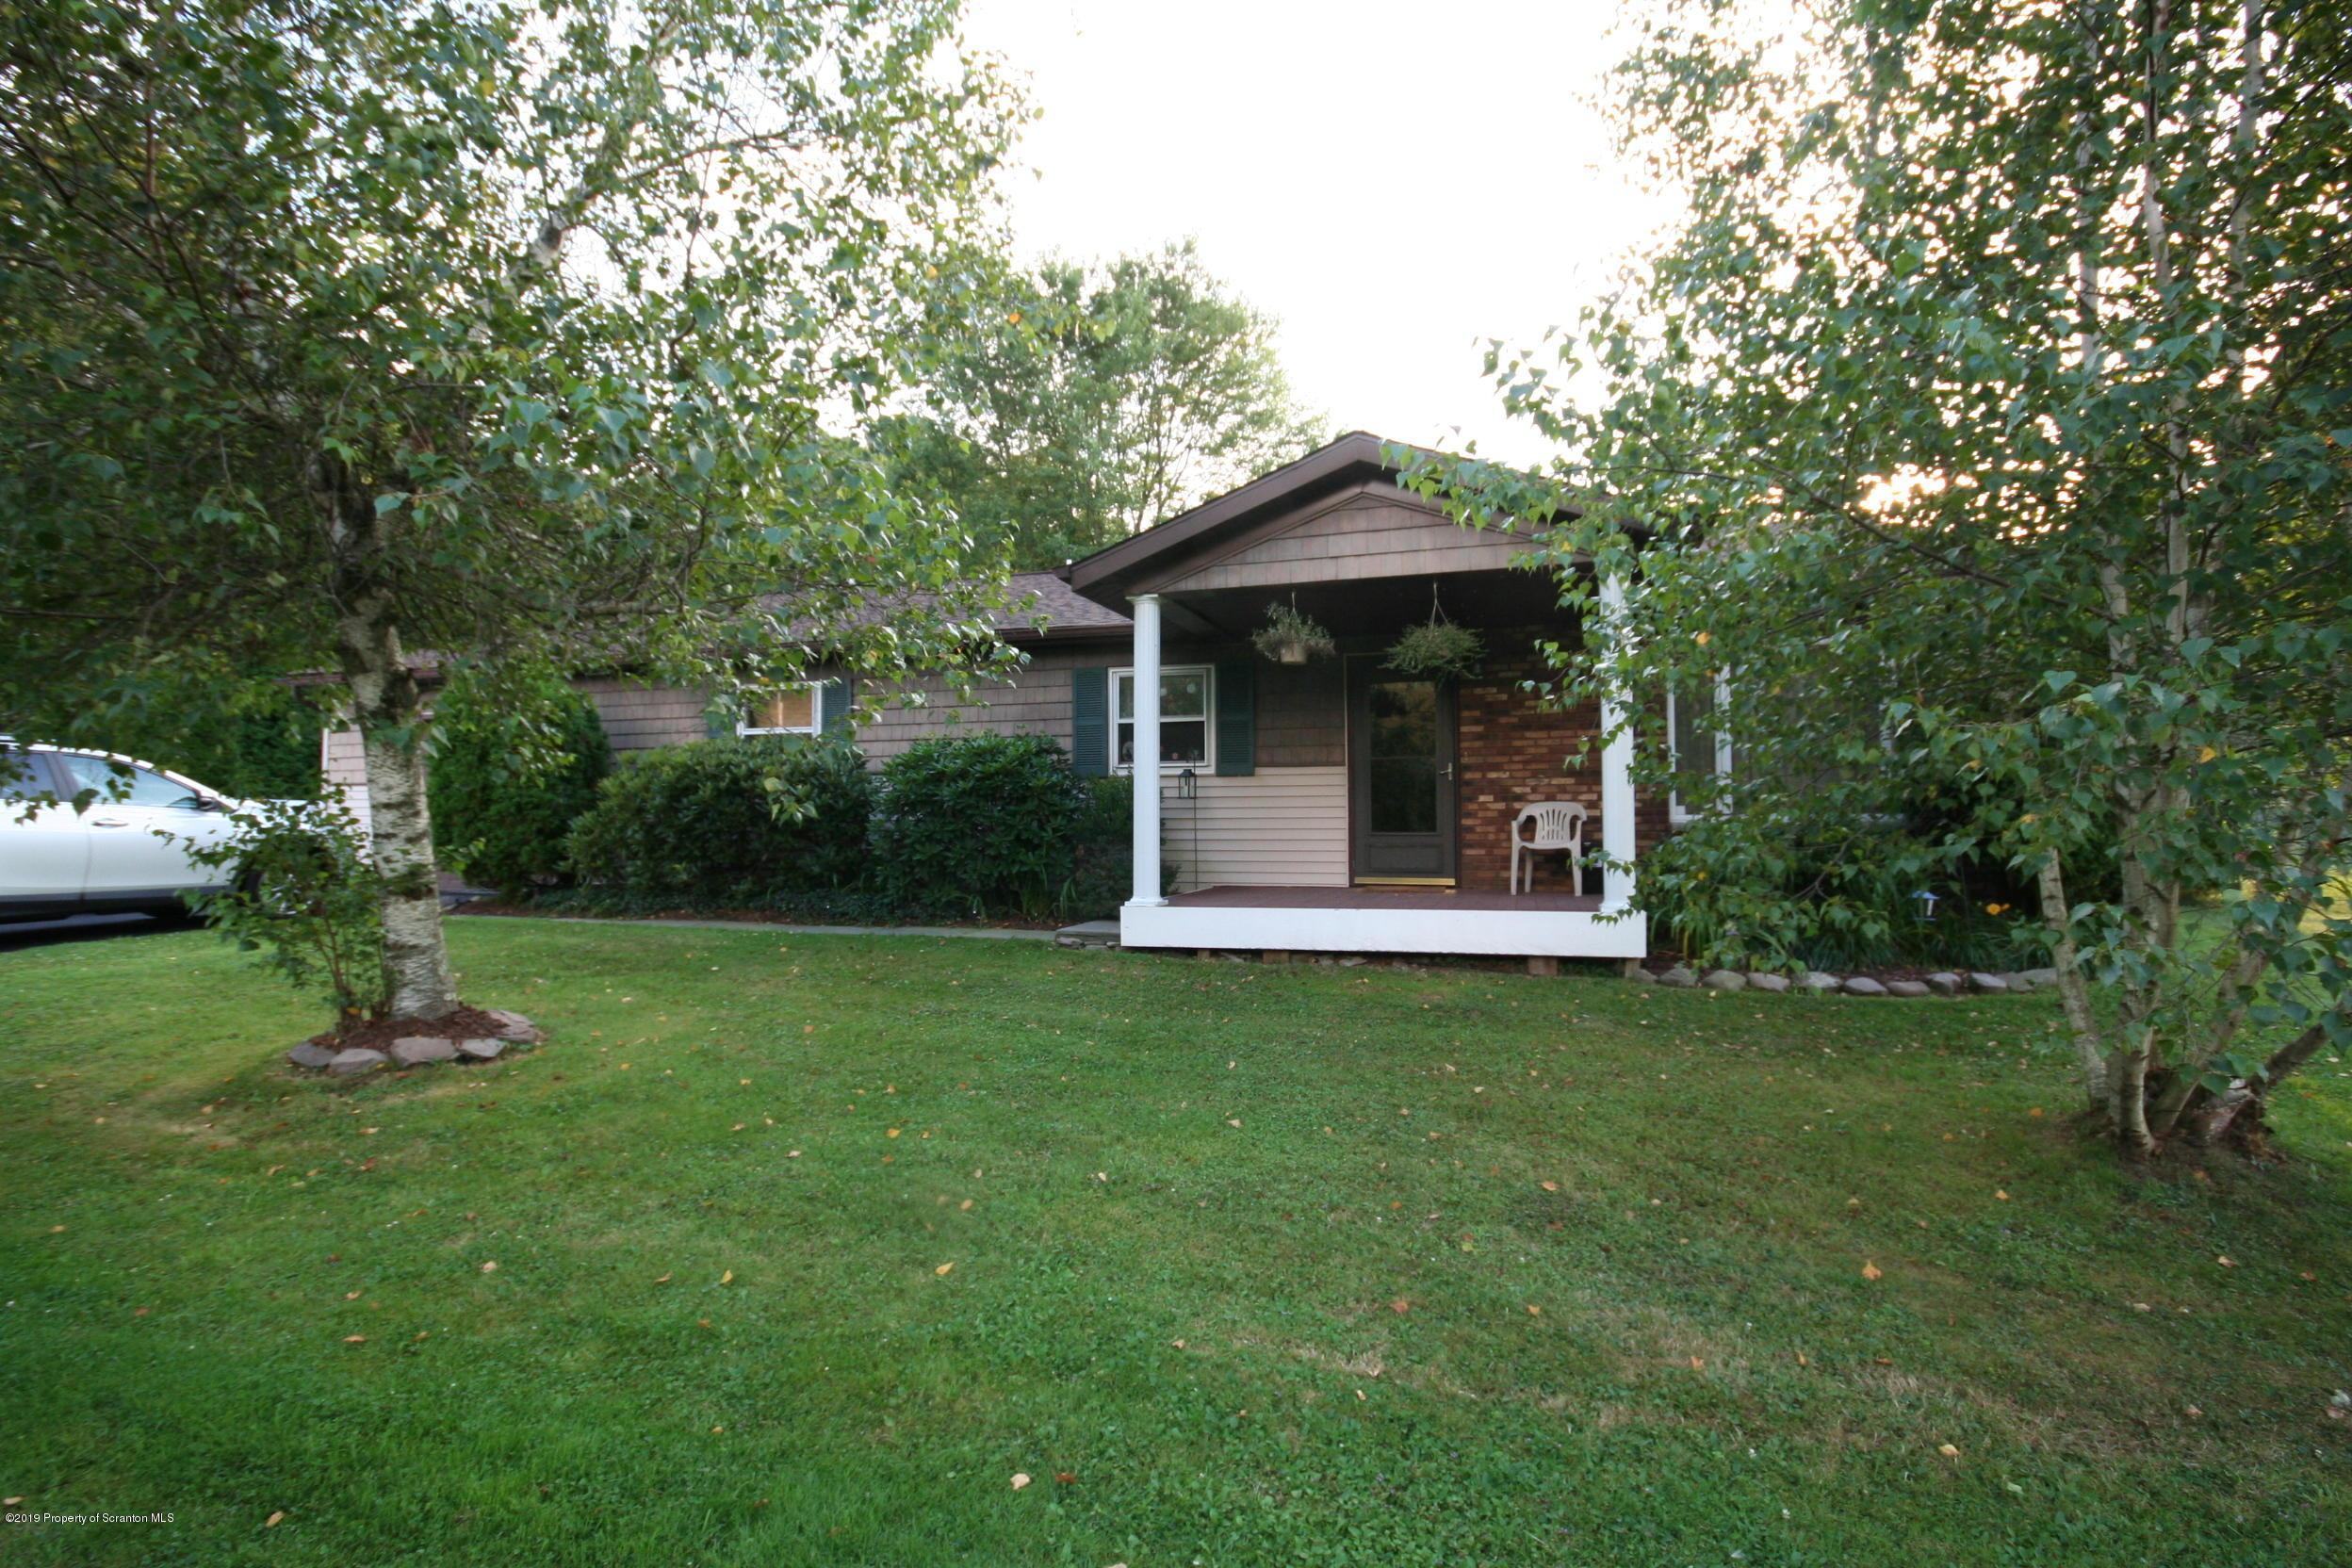 765 Lakeland Dr, Scott Twp, Pennsylvania 18447, 3 Bedrooms Bedrooms, 6 Rooms Rooms,2 BathroomsBathrooms,Single Family,For Sale,Lakeland,19-4278